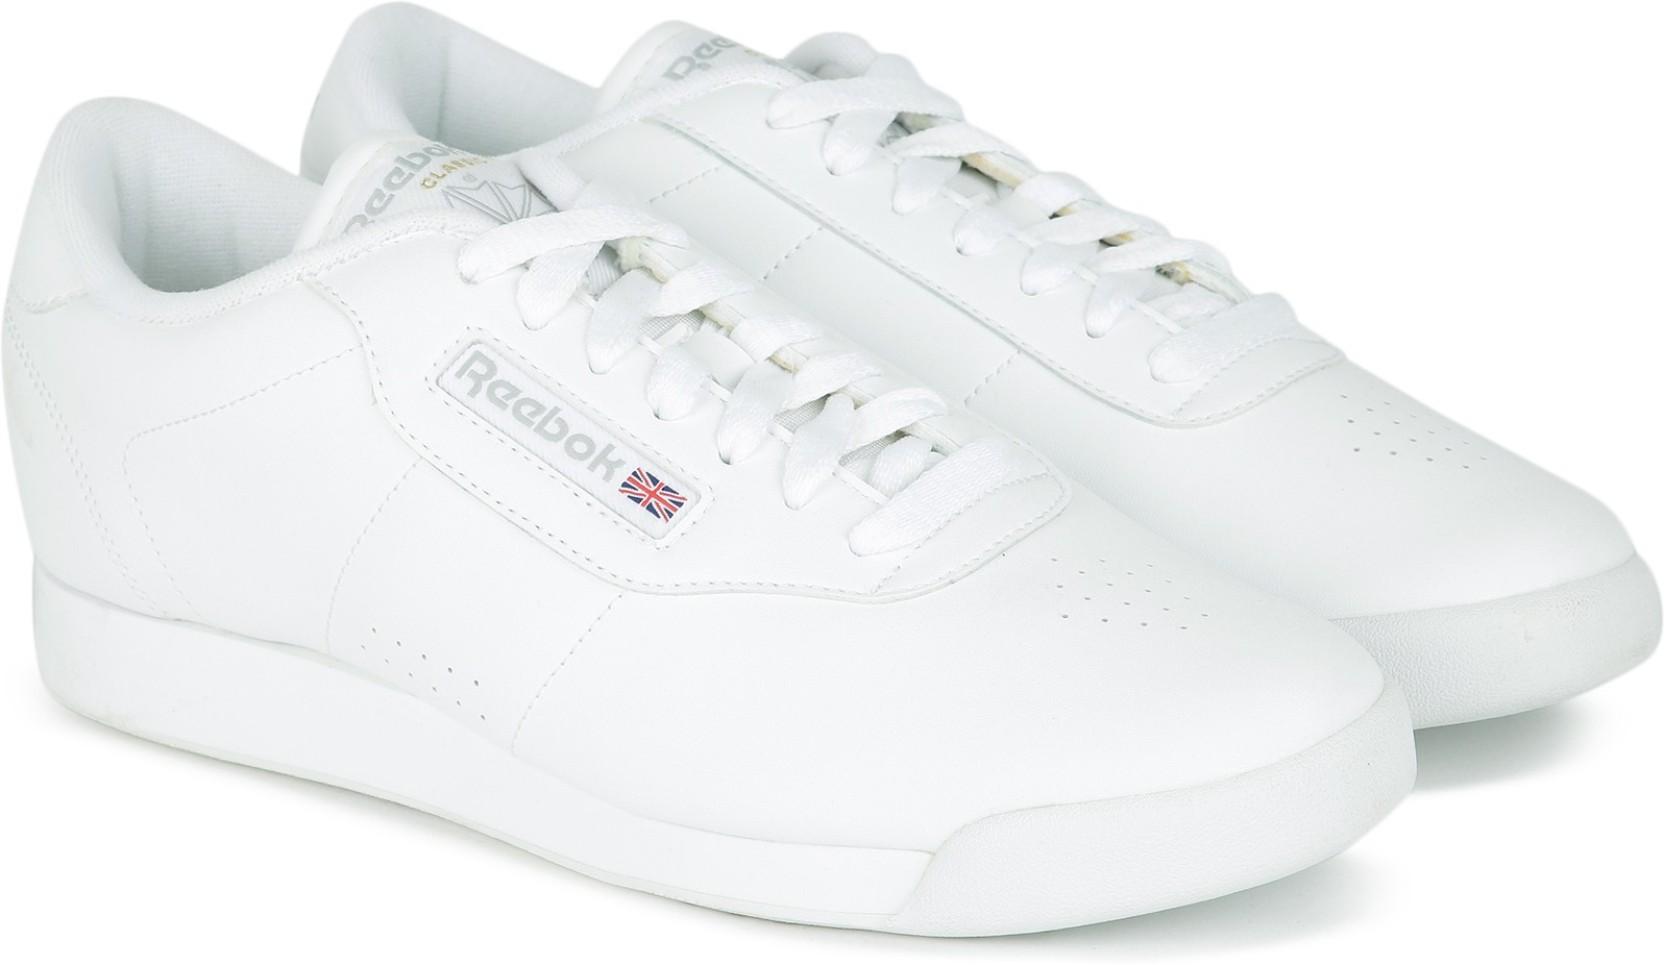 REEBOK CLASSICS PRINCESS Sneaker For Women - Buy WHITE INTL Color ... 8ff8f35bb